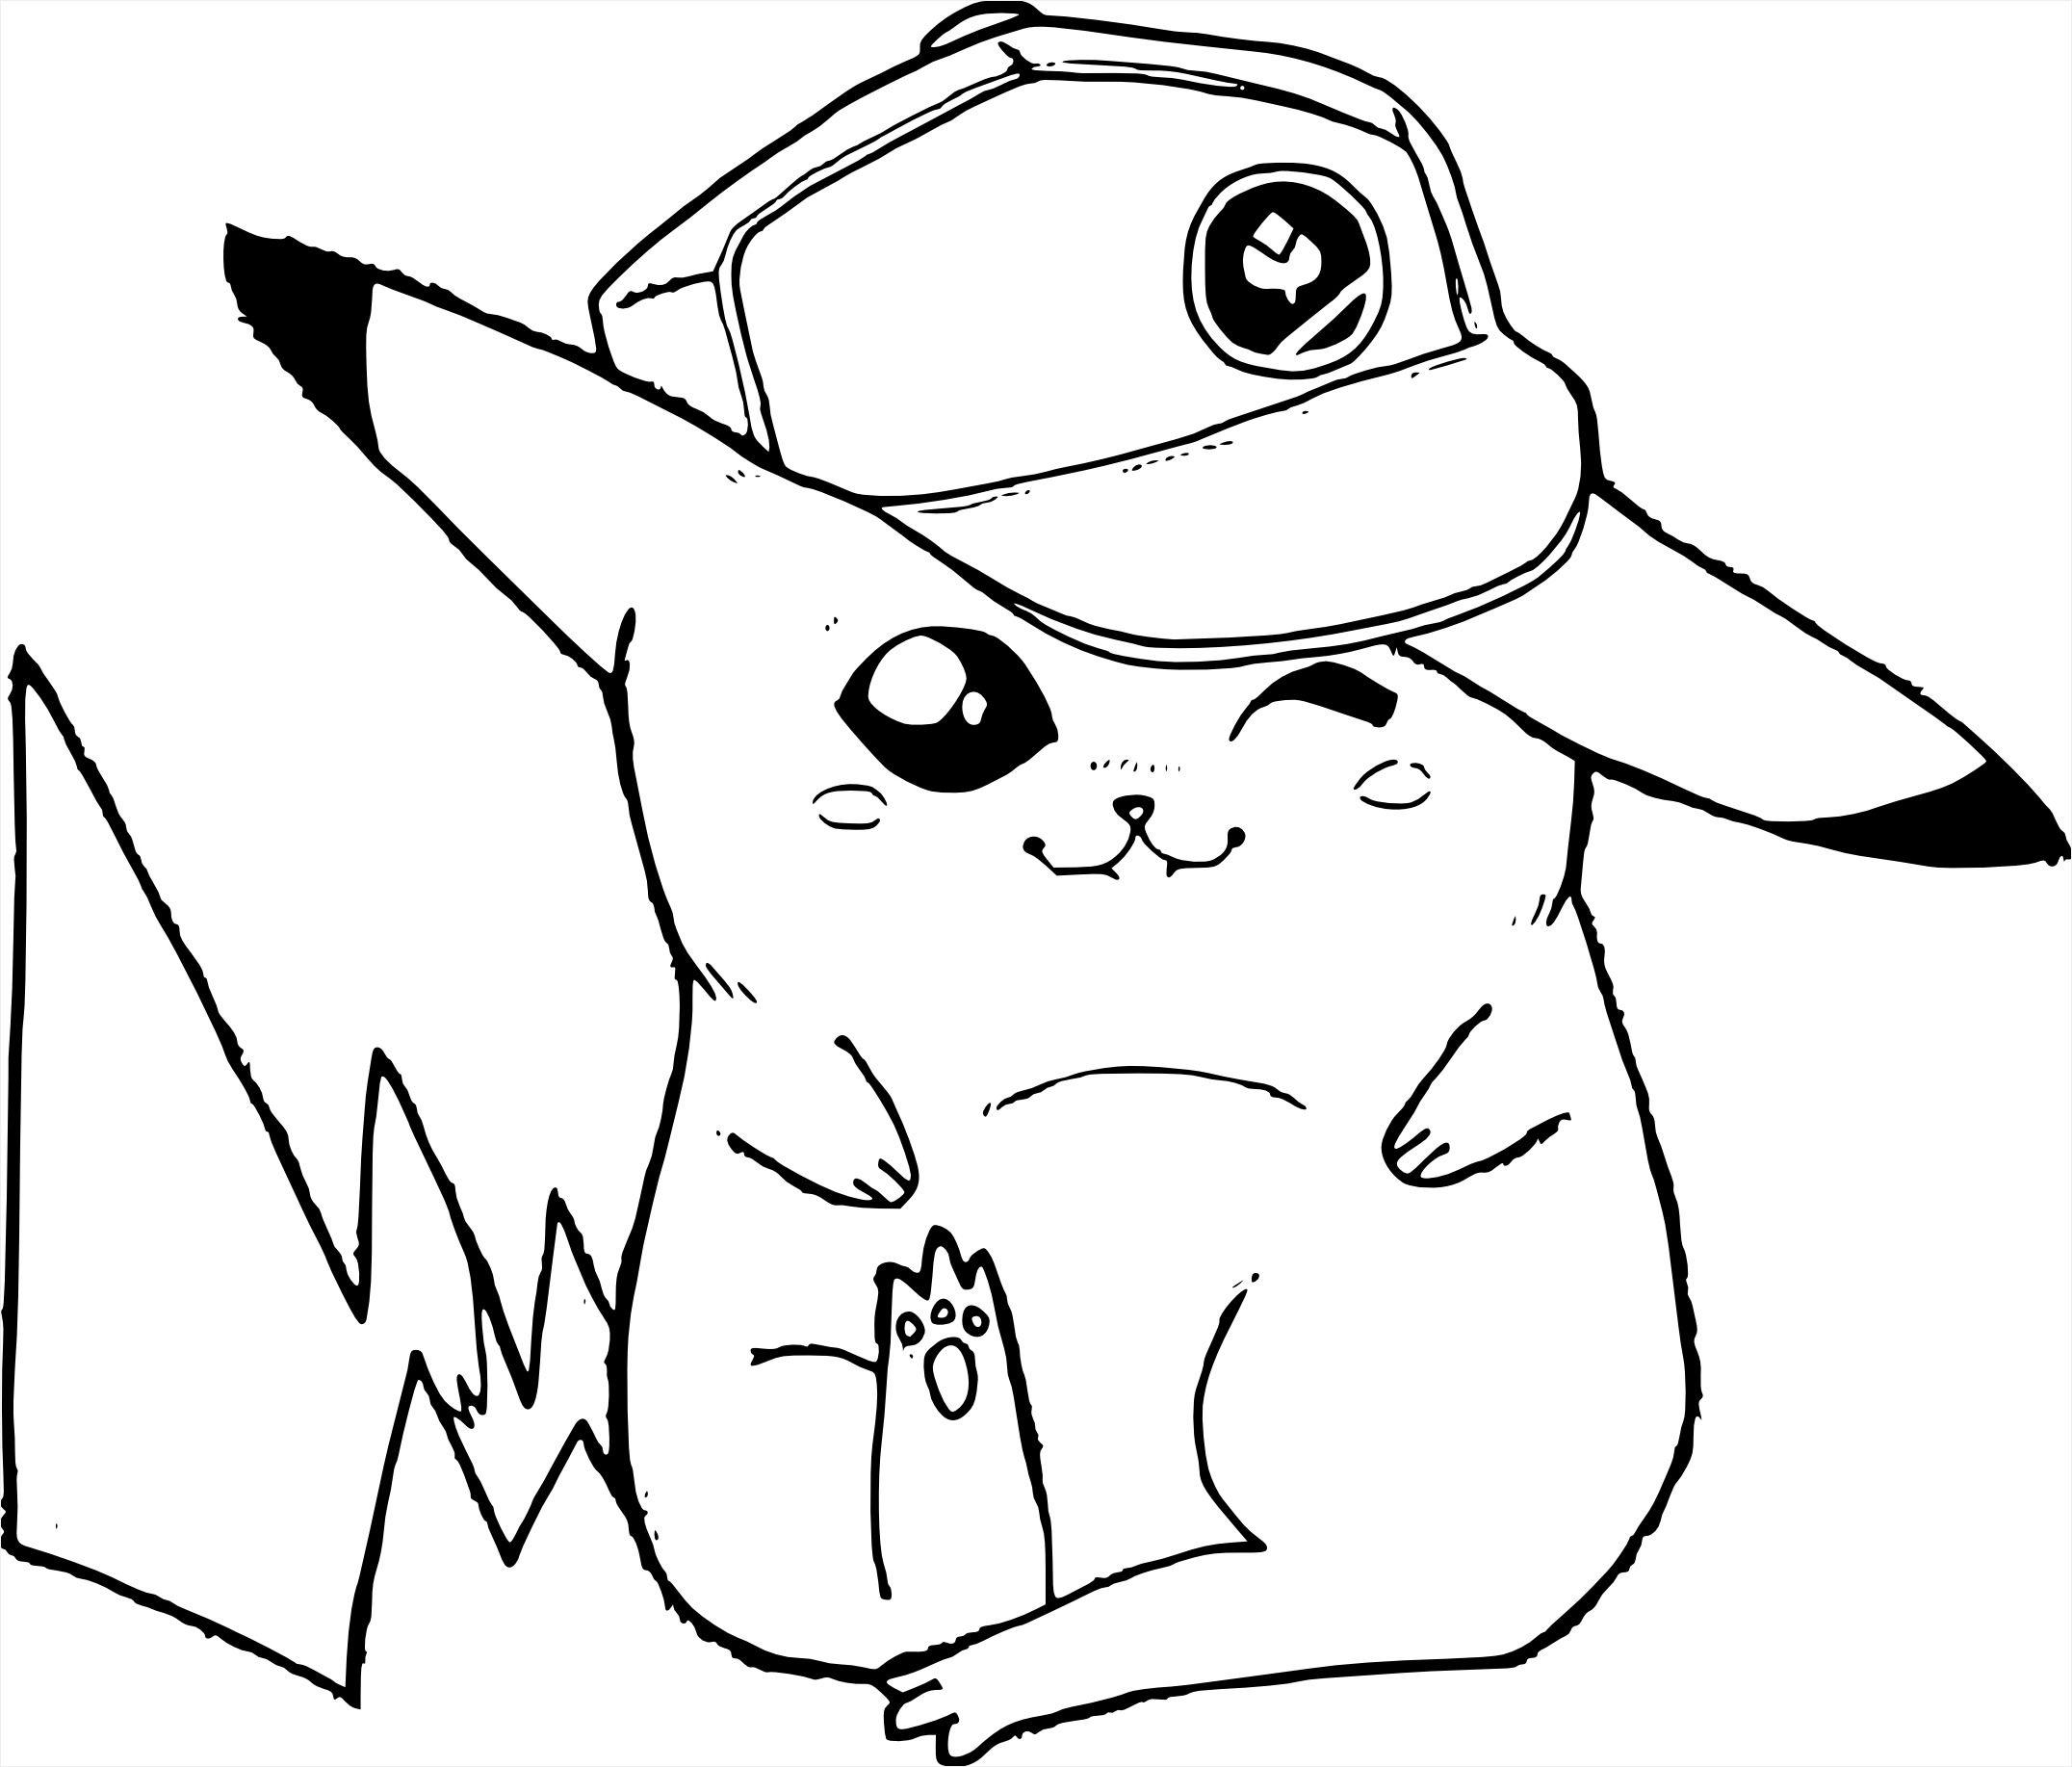 Coloriage Pikachu Mignon De Dessin Coloriage Pikachu Symcomp